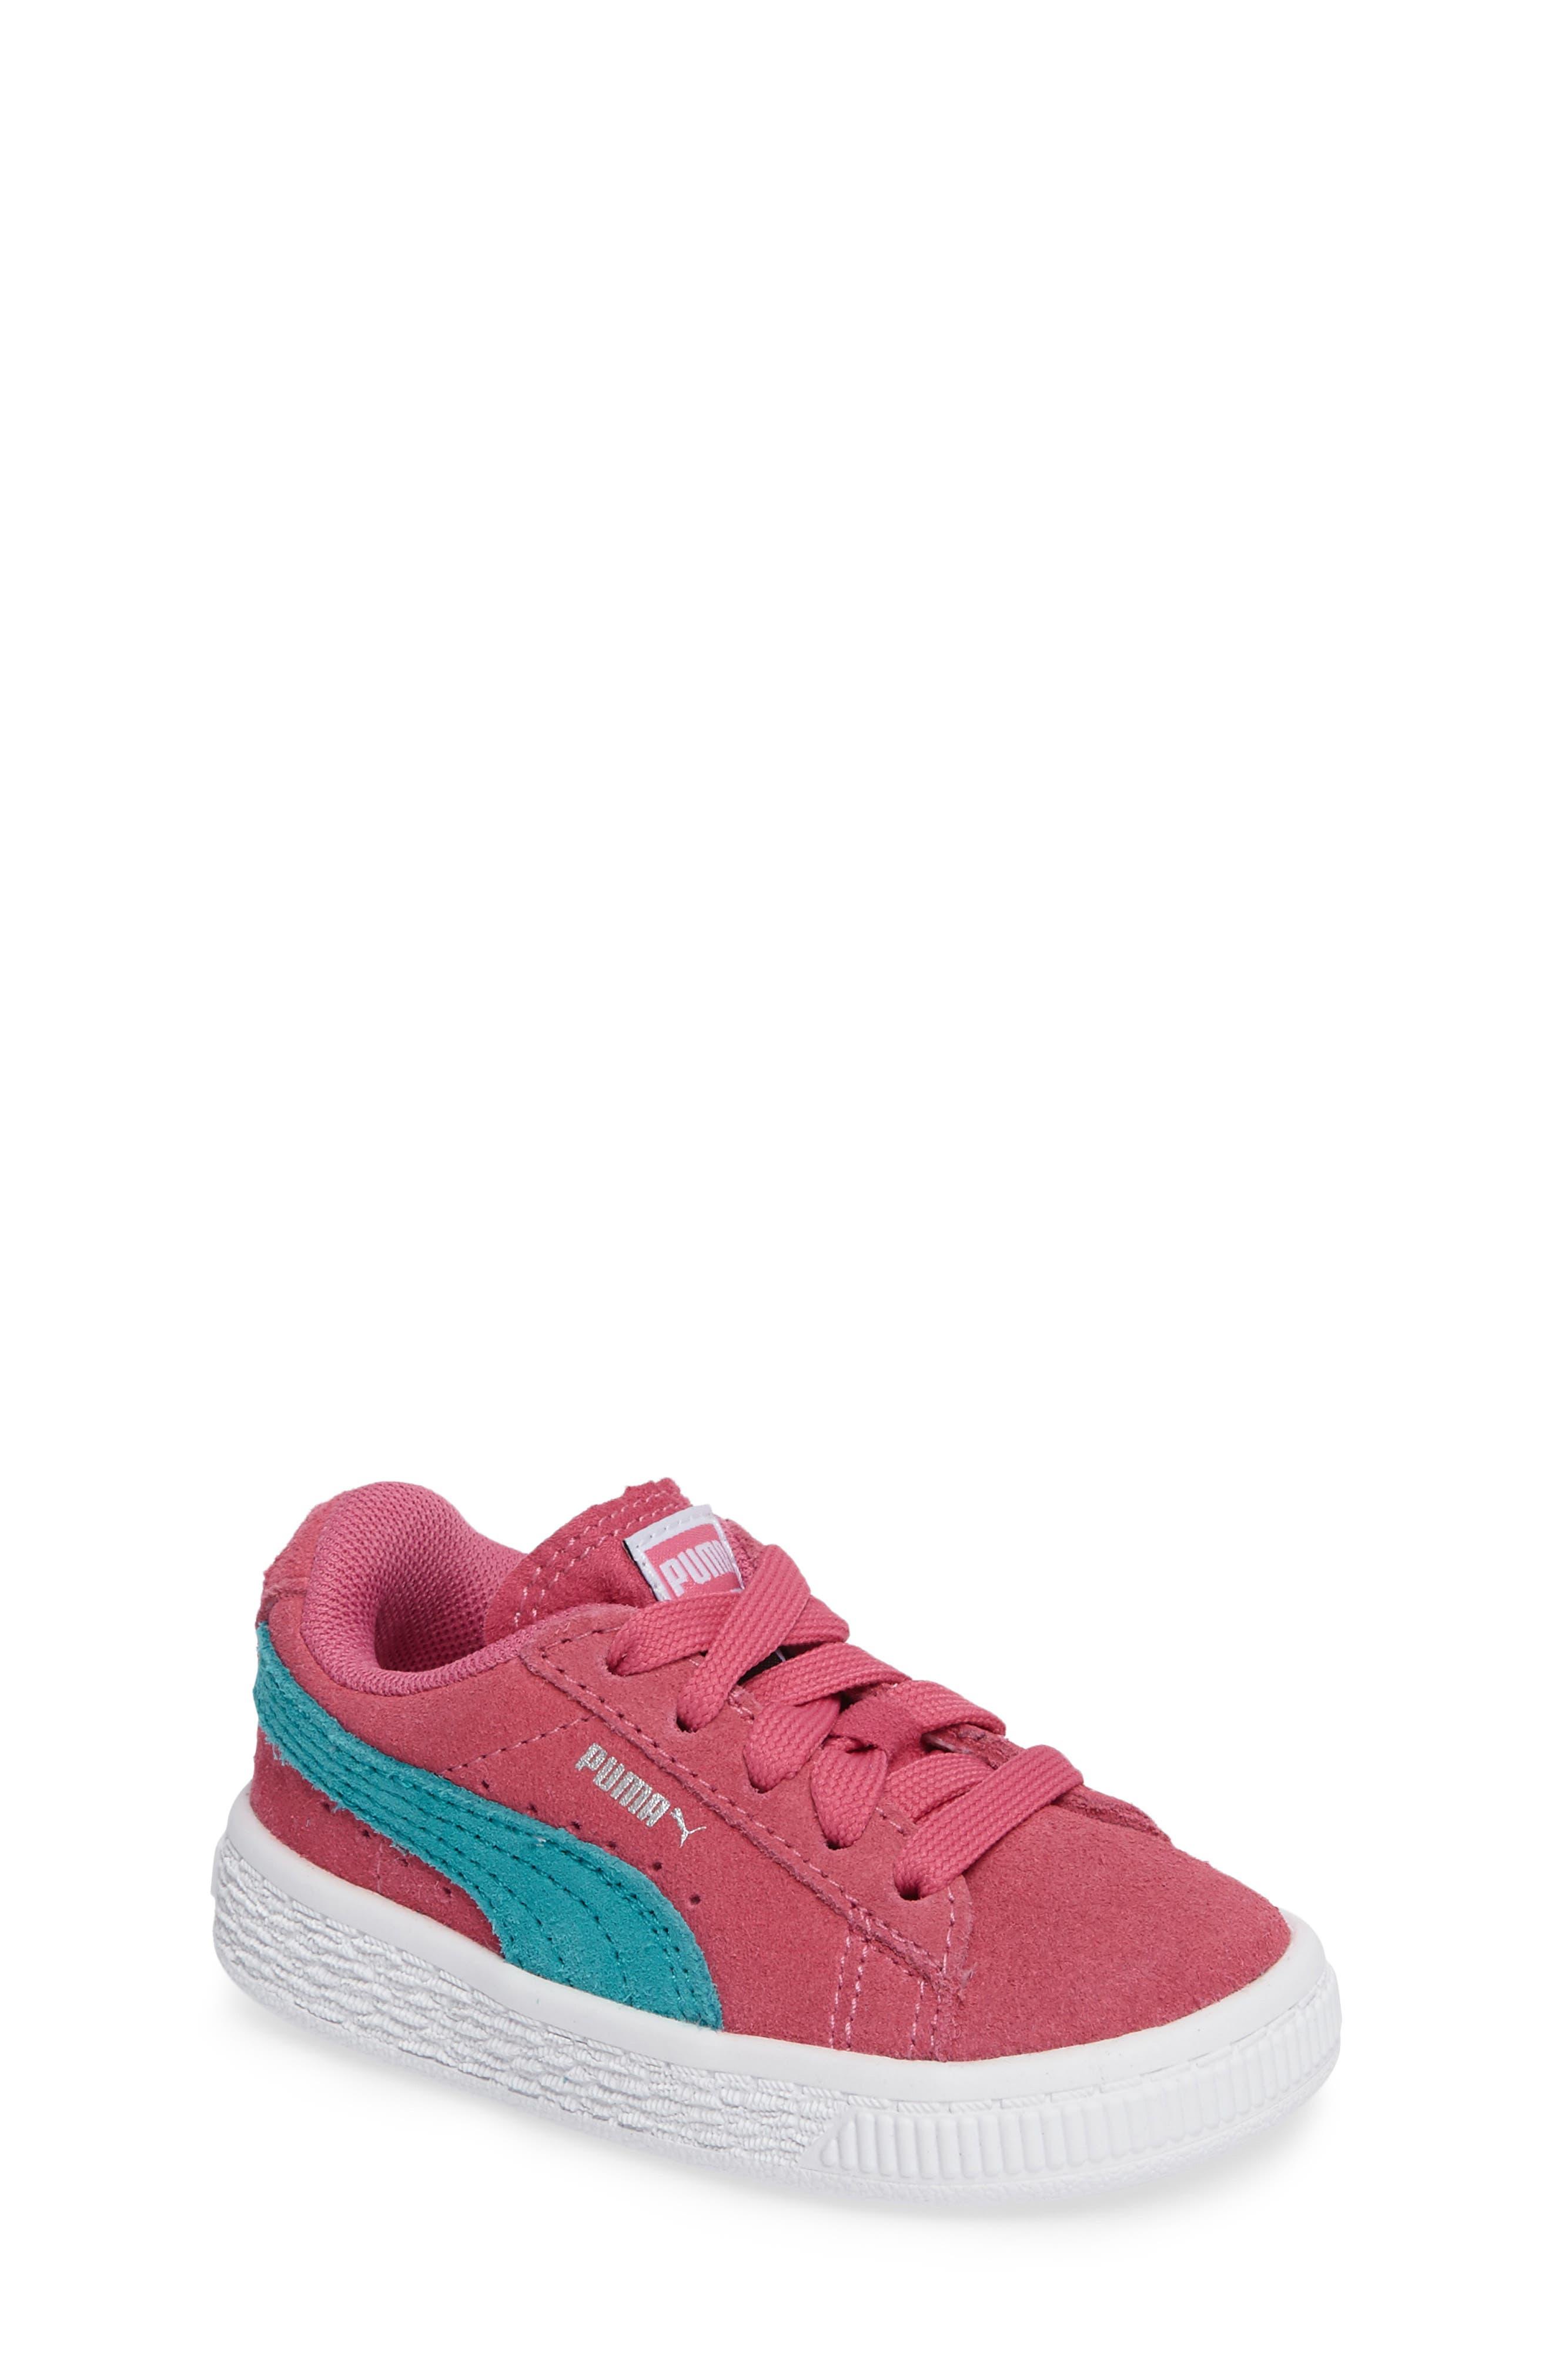 PUMA Suede Sneaker (Baby, Toddler & Walker)